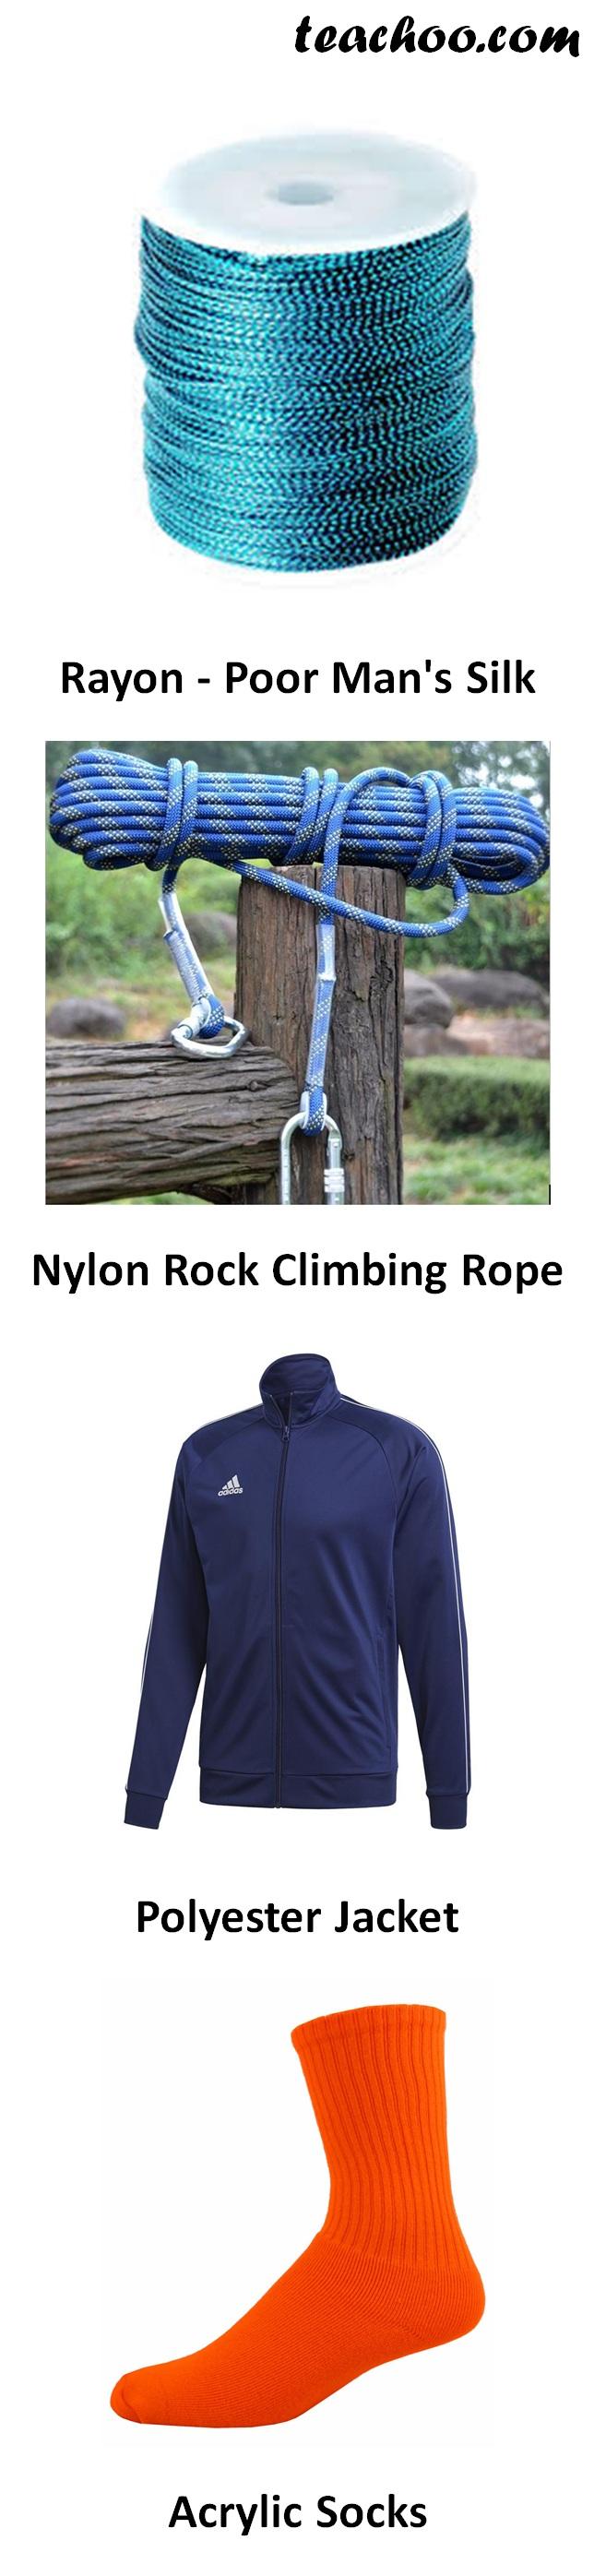 Nylon - rayon - polyster - acrylic Merge.jpg